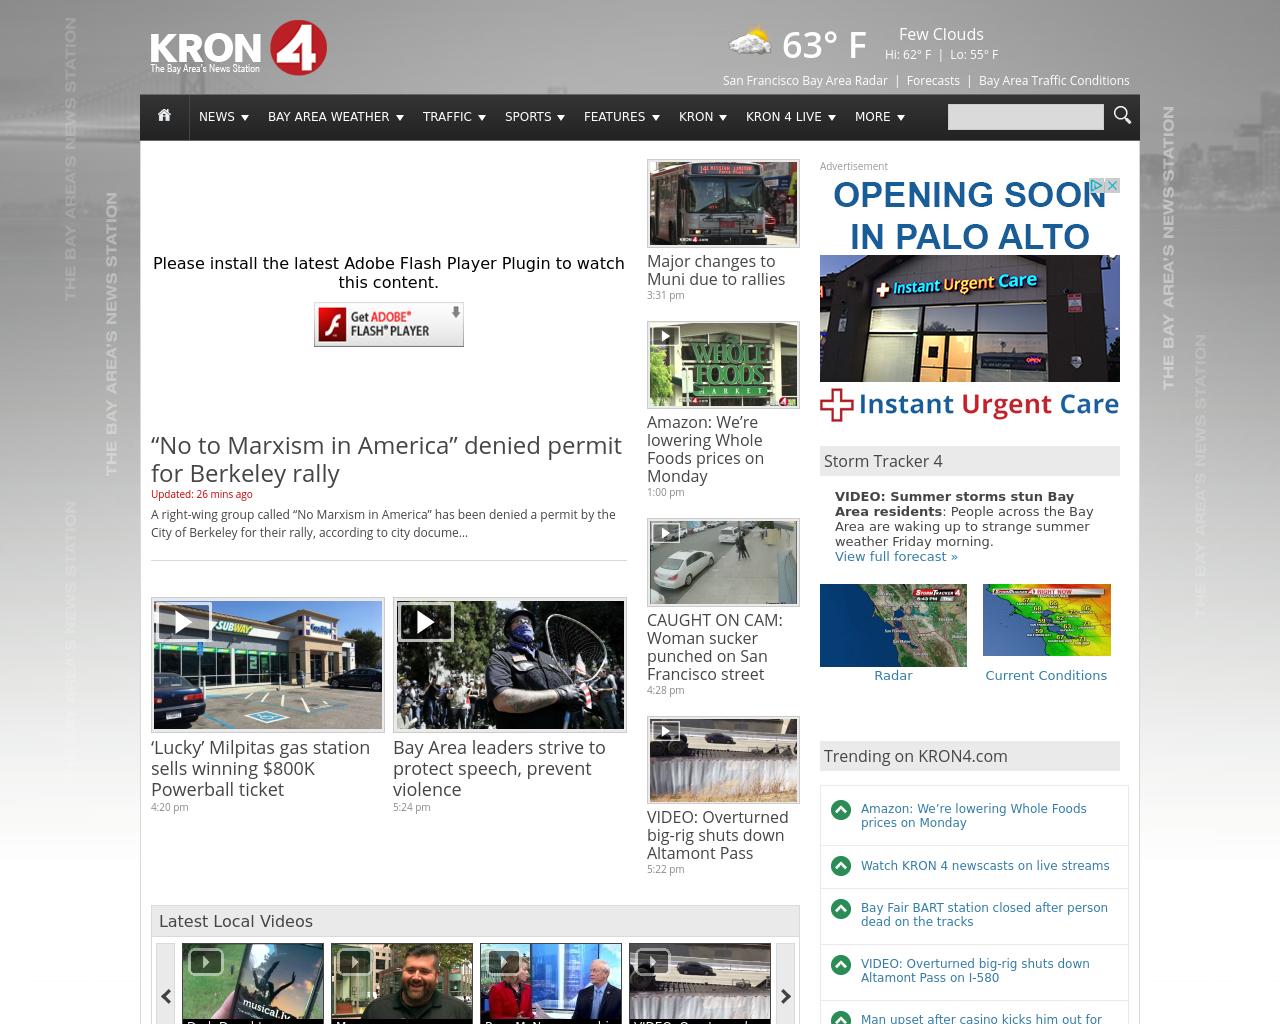 Kron-4-Digital-Advertising-Reviews-Pricing